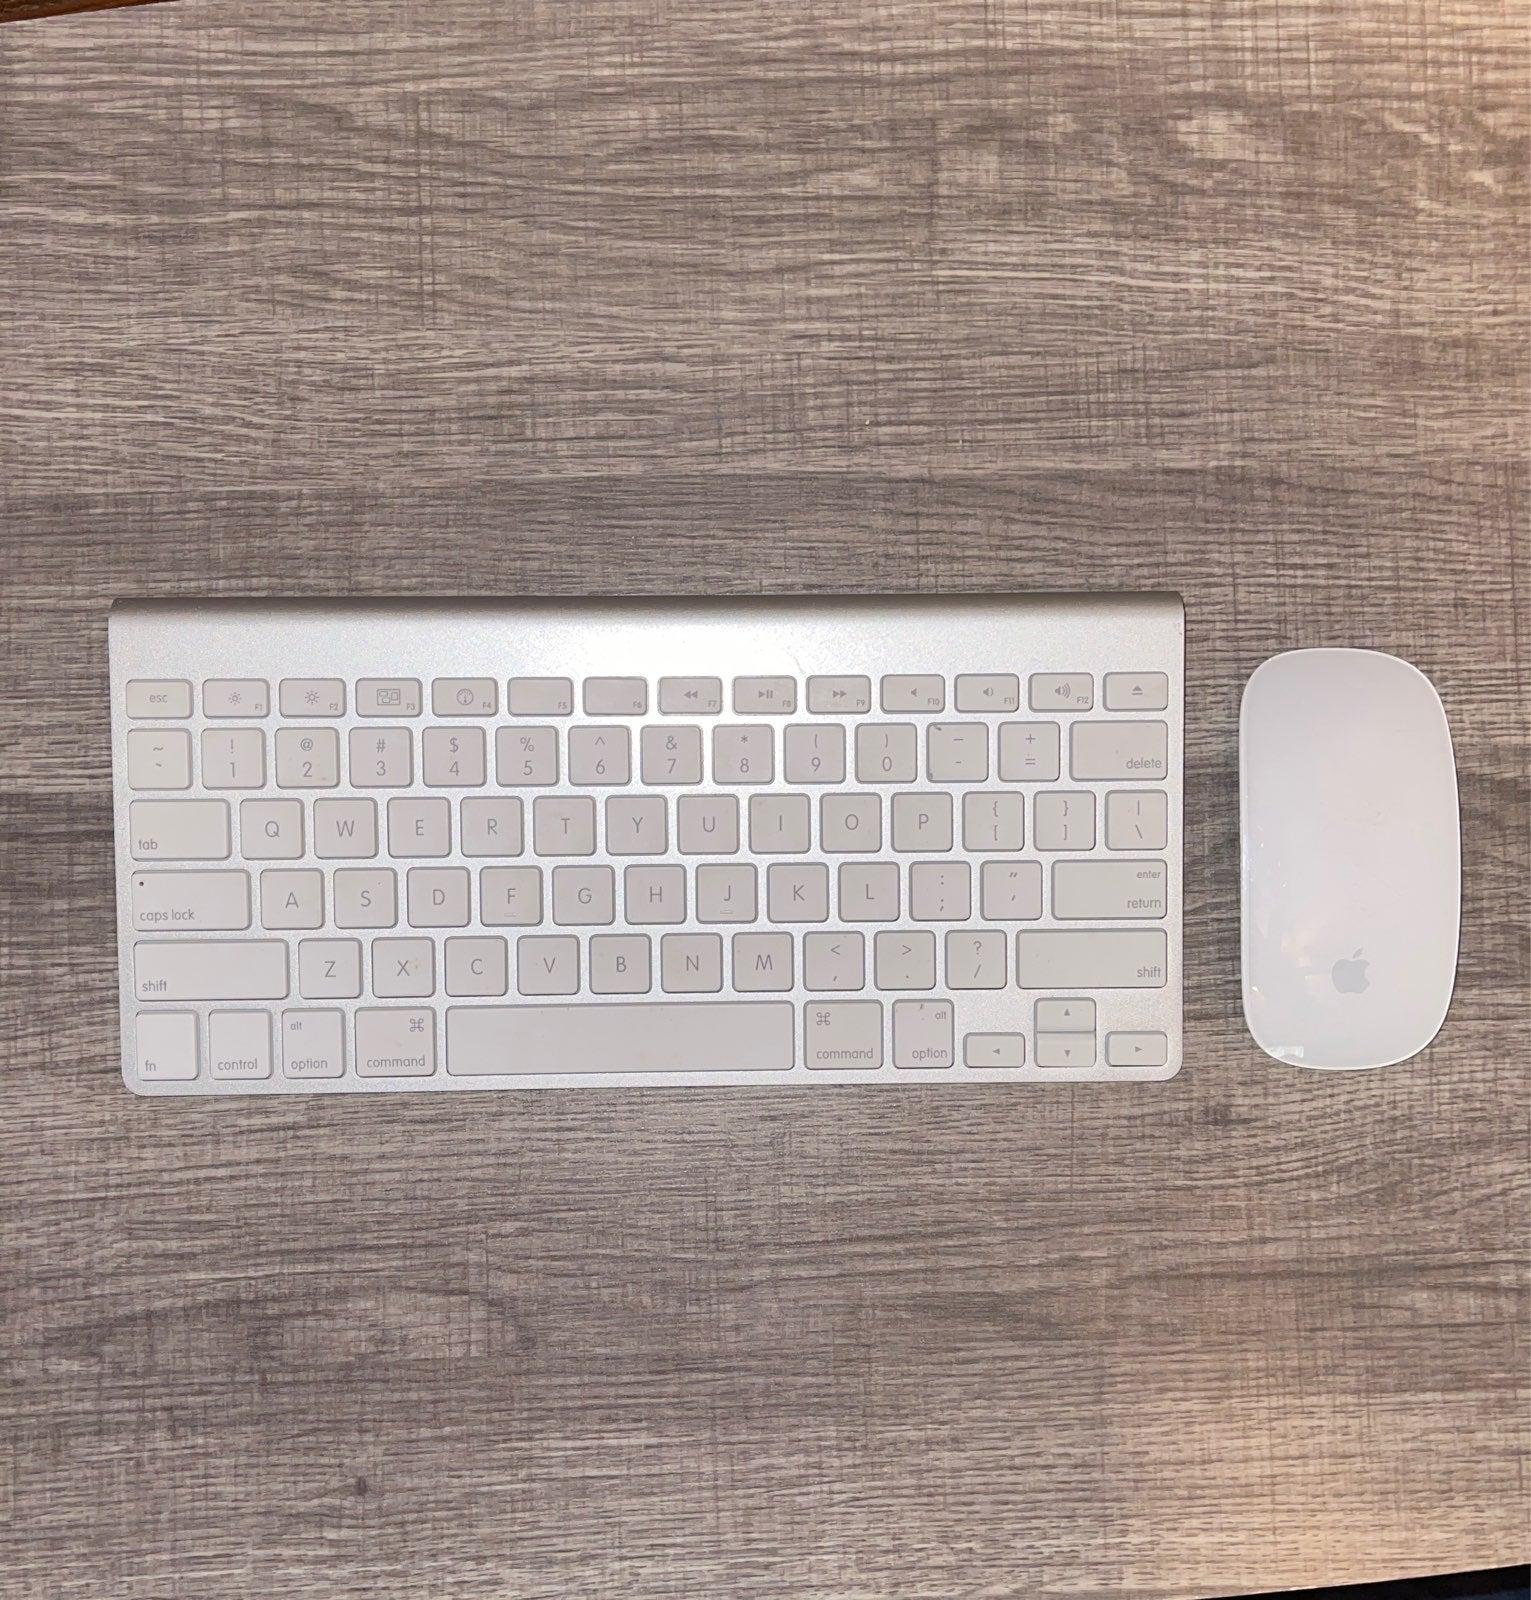 Apple Wireless Magic Keyboard a1314